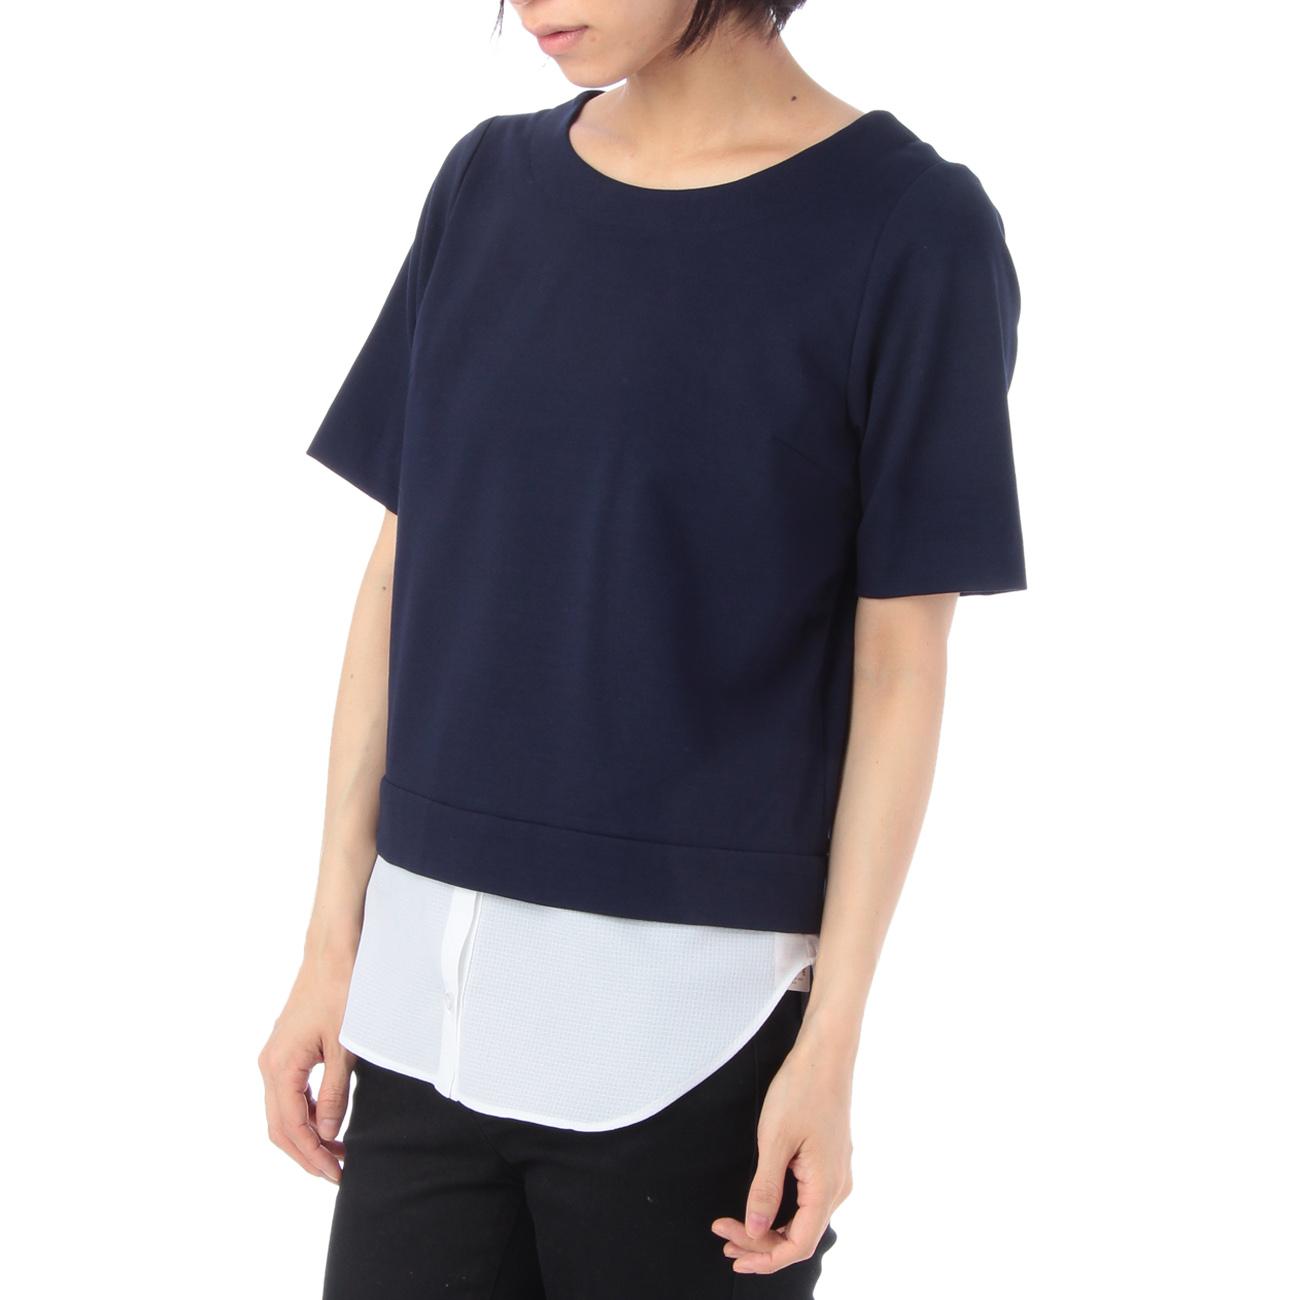 【index (インデックス)】シャツ裾ボンチプルオーバーレディース トップス|その他トップス ネイビー